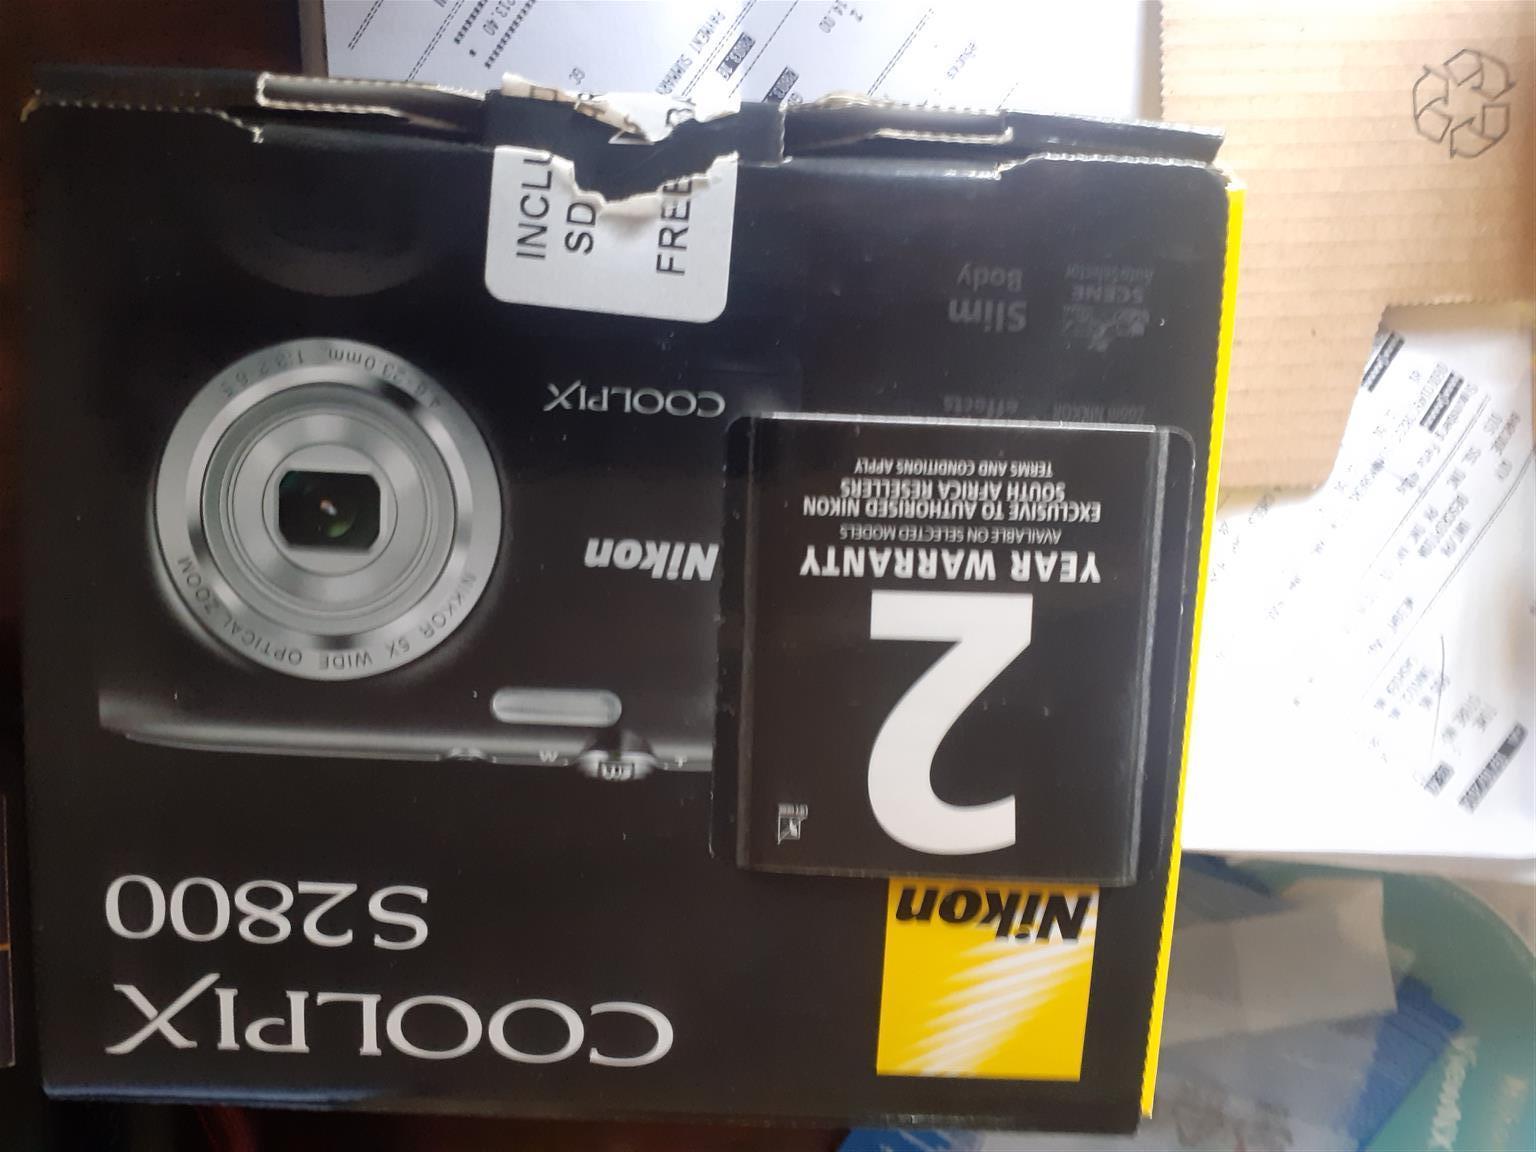 Nikon Coolpix S2800 brand new